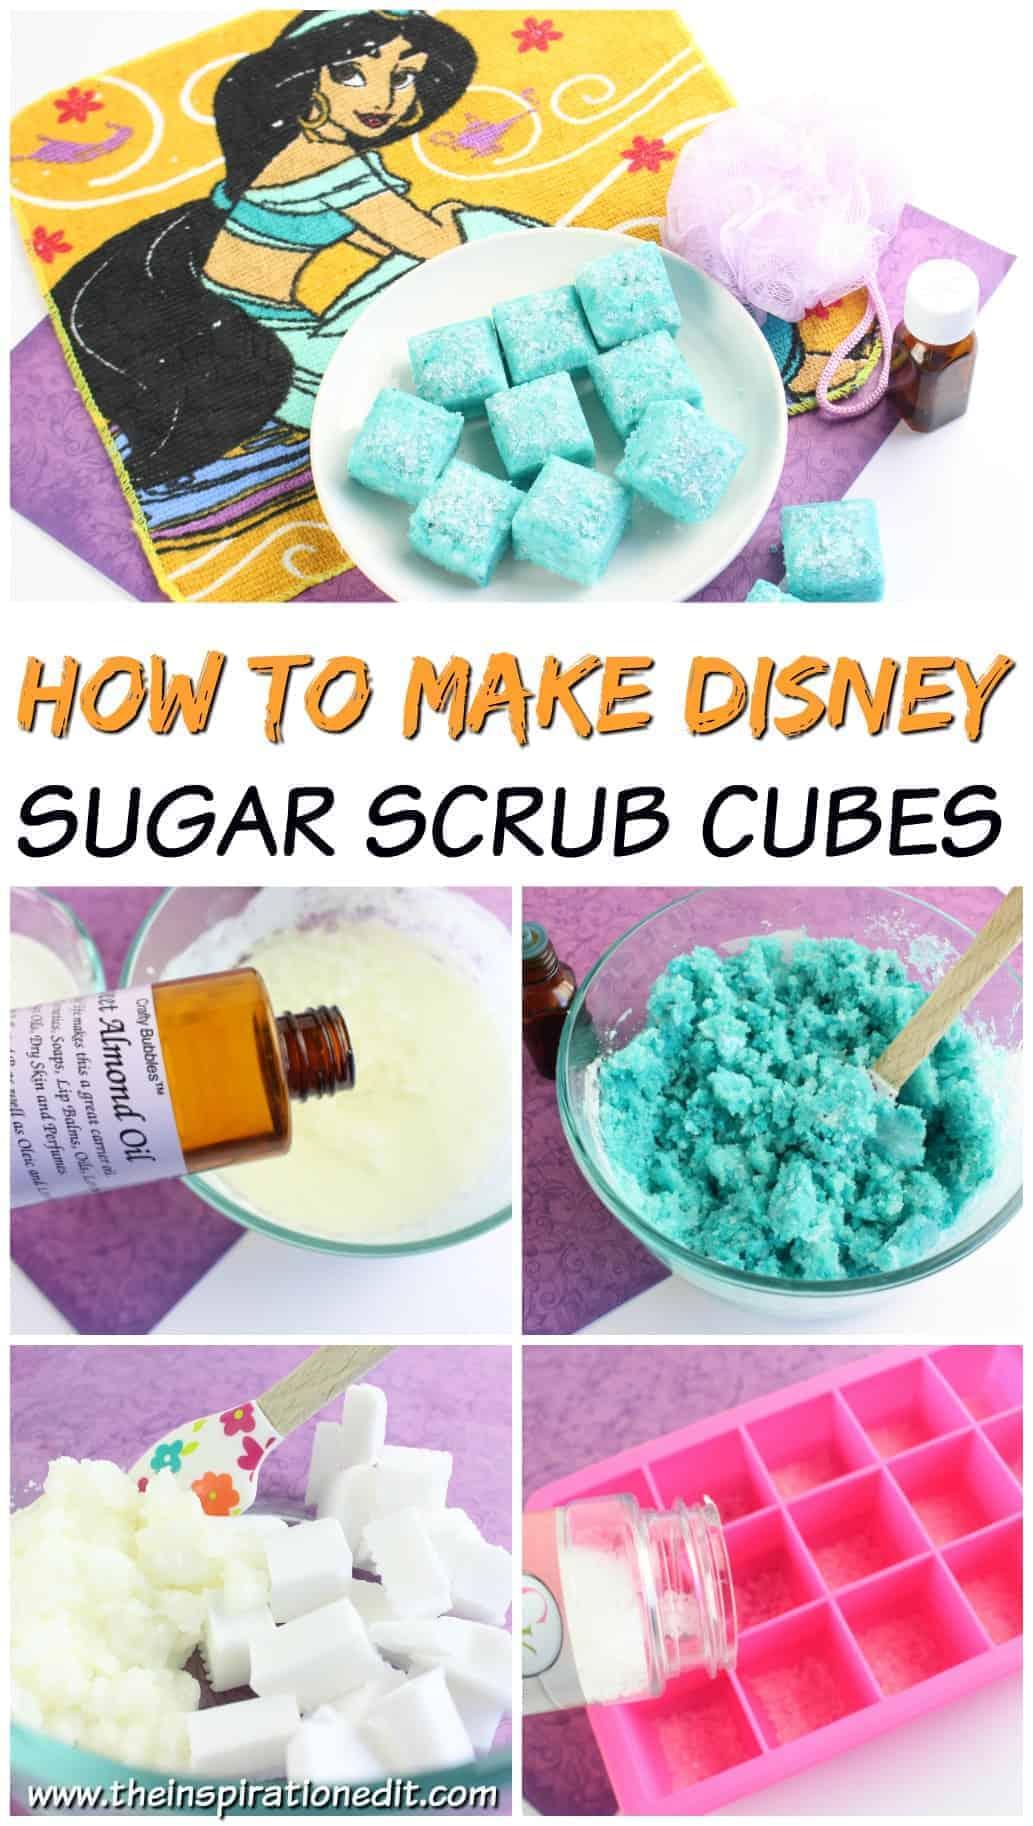 How to Make Disney Sugar Scrub Cubes Pin